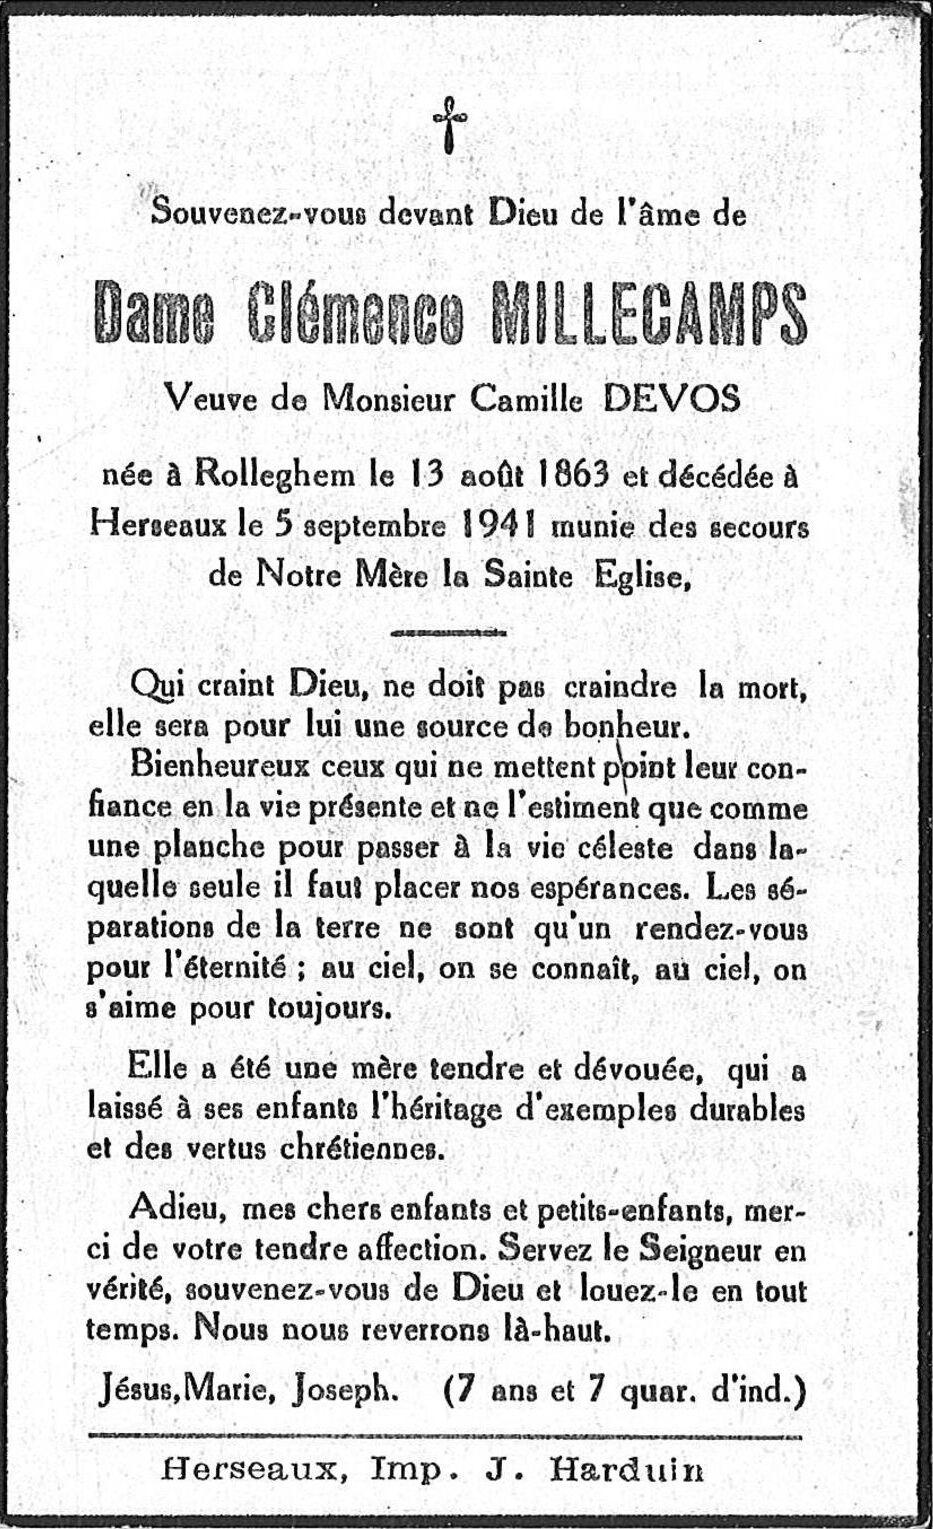 Clémence Millecamps